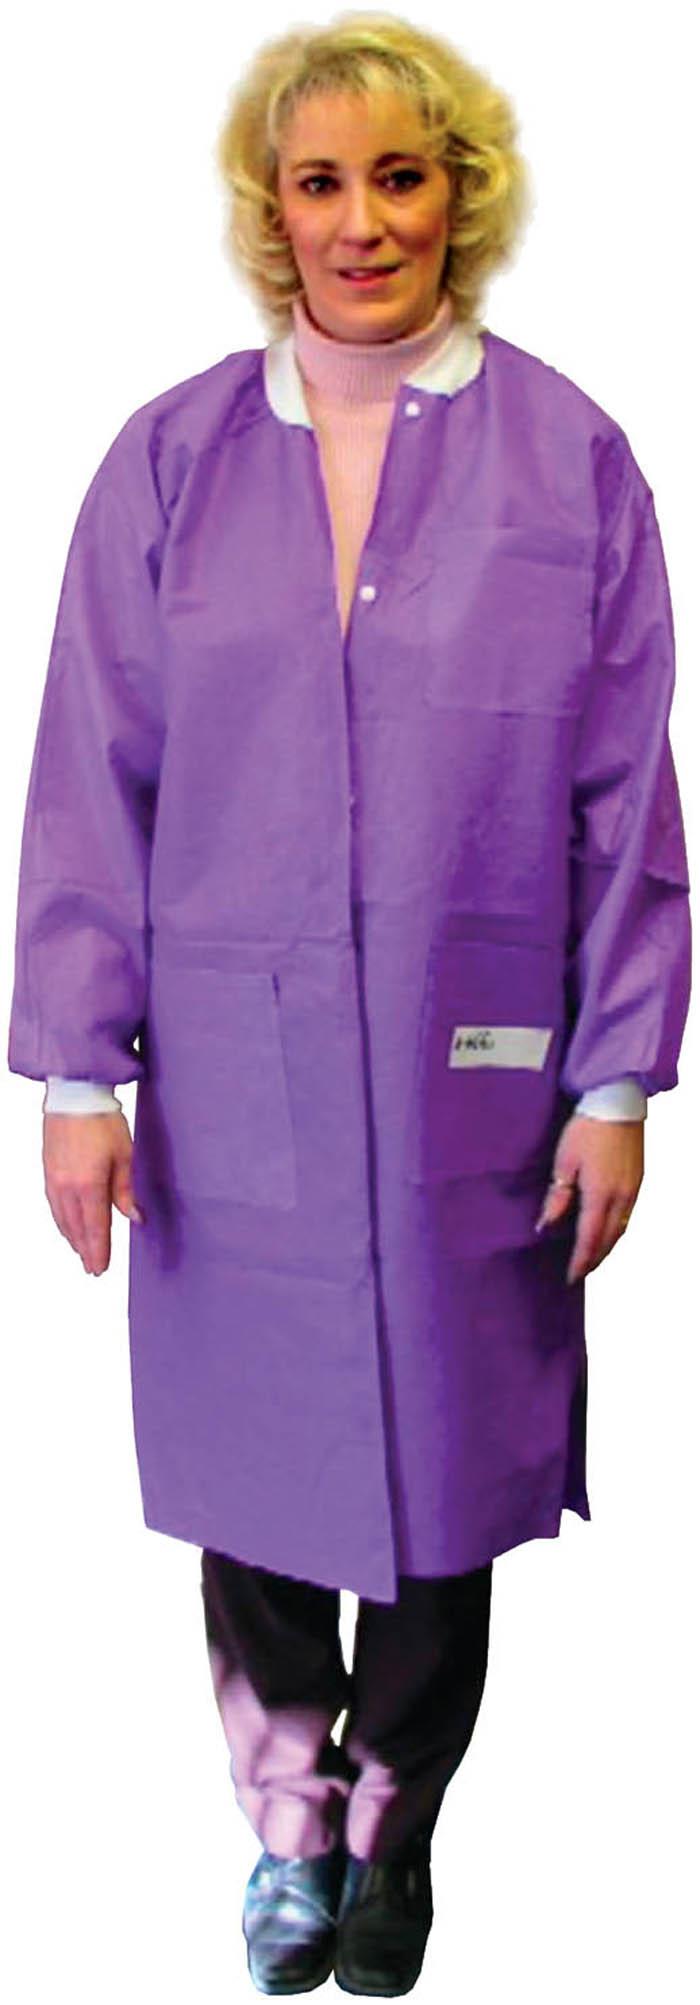 Disposable Lab Jacket. Hip length. Teal Green. Large